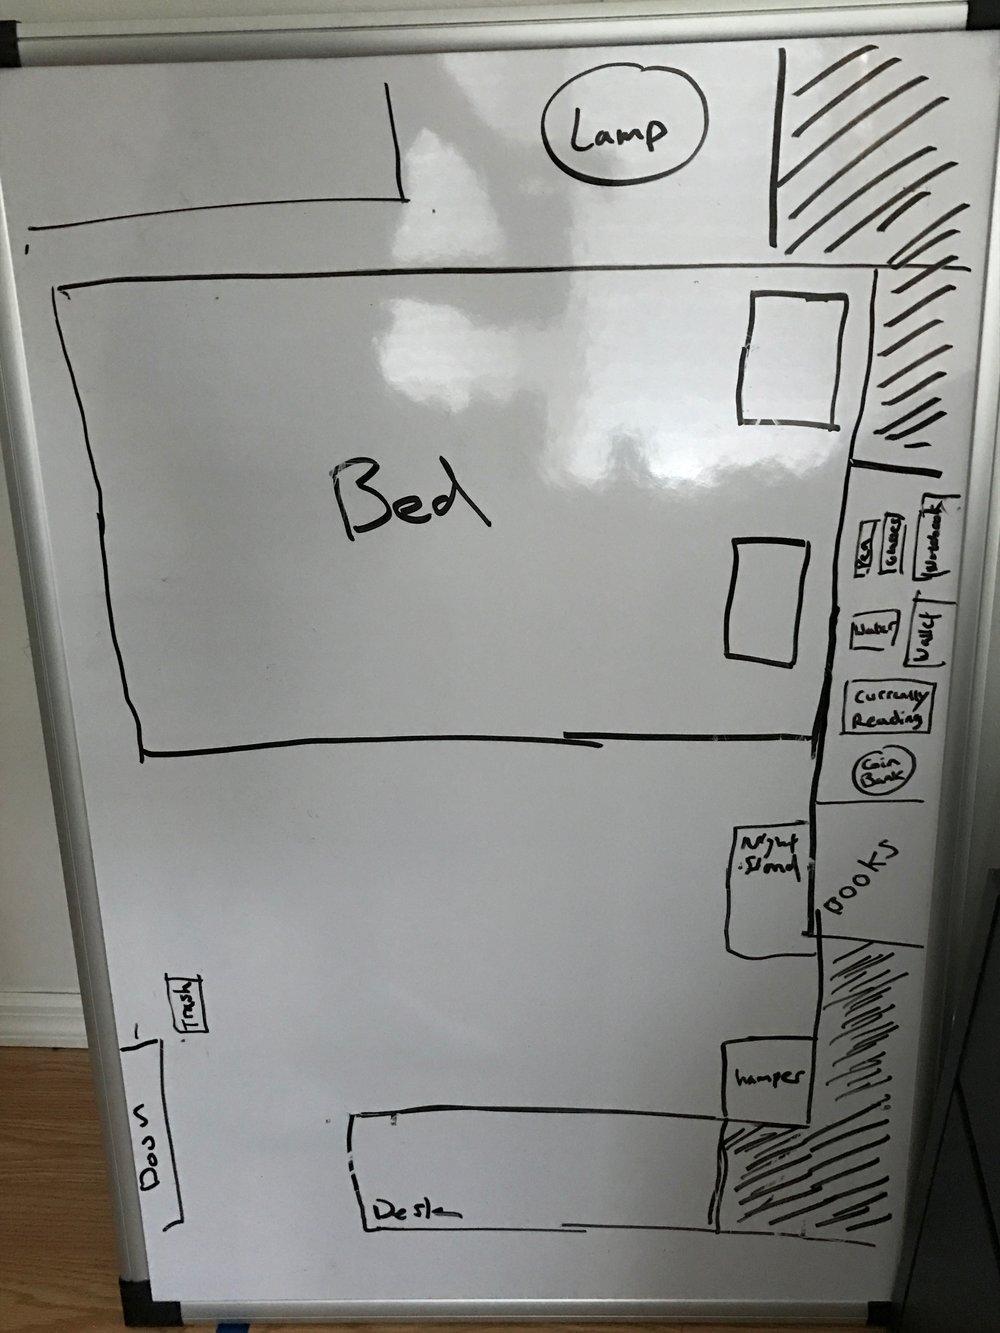 I like whiteboards.